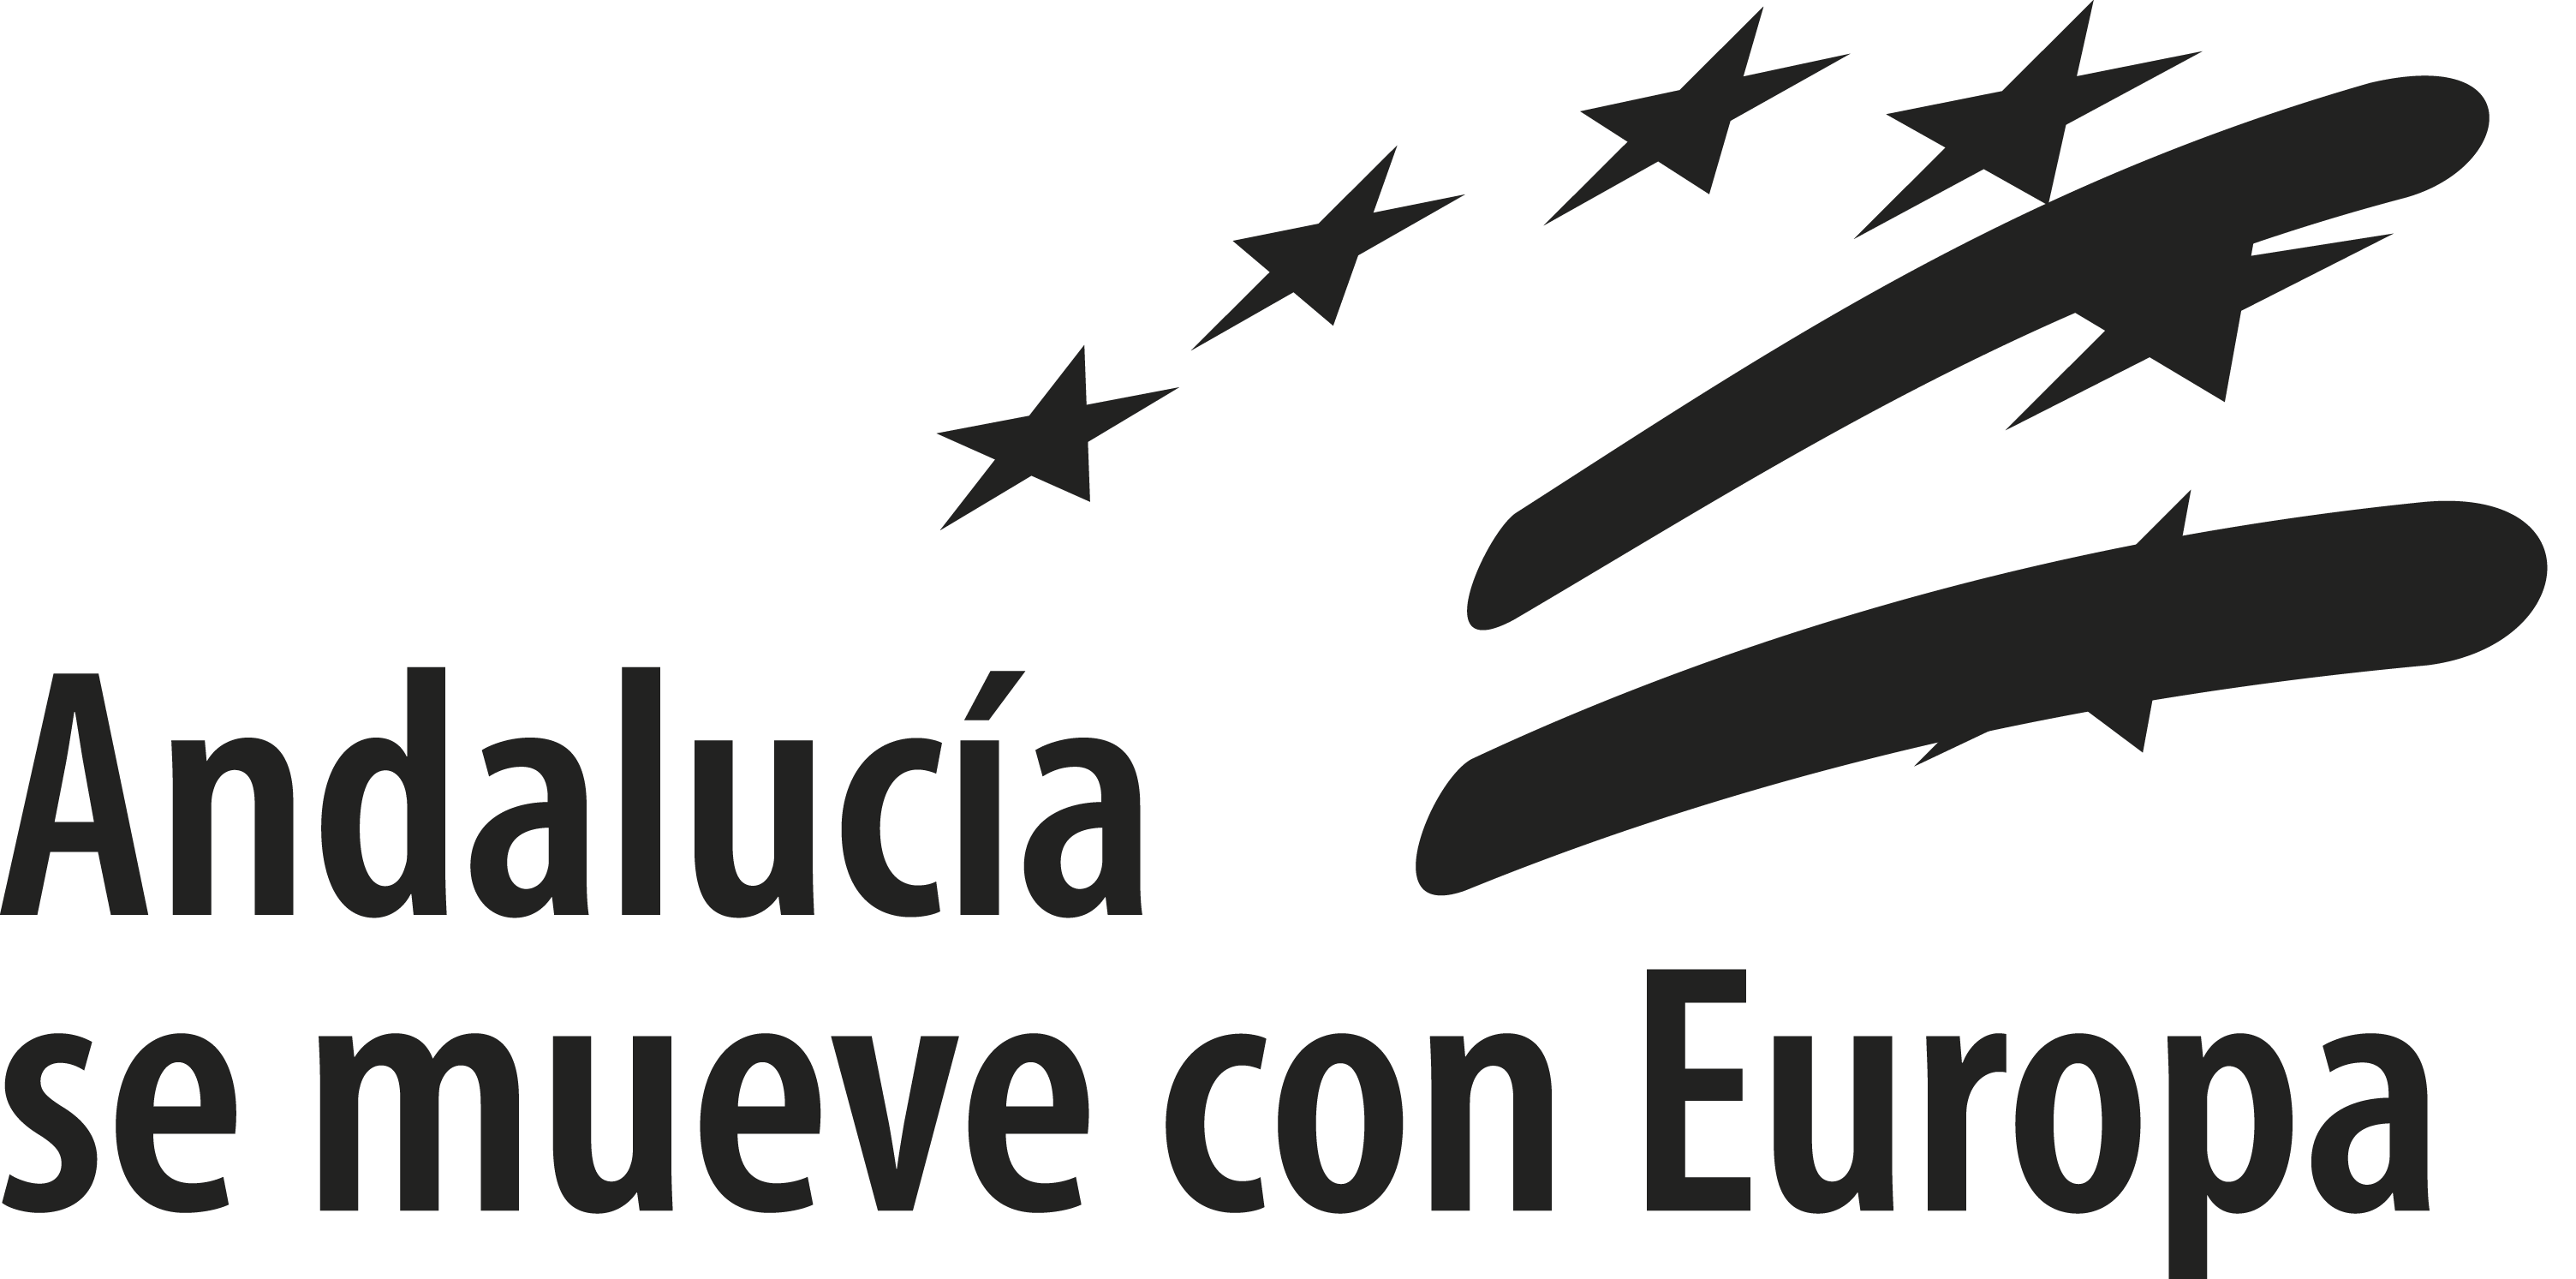 Andaluc�a se mueve con Europa